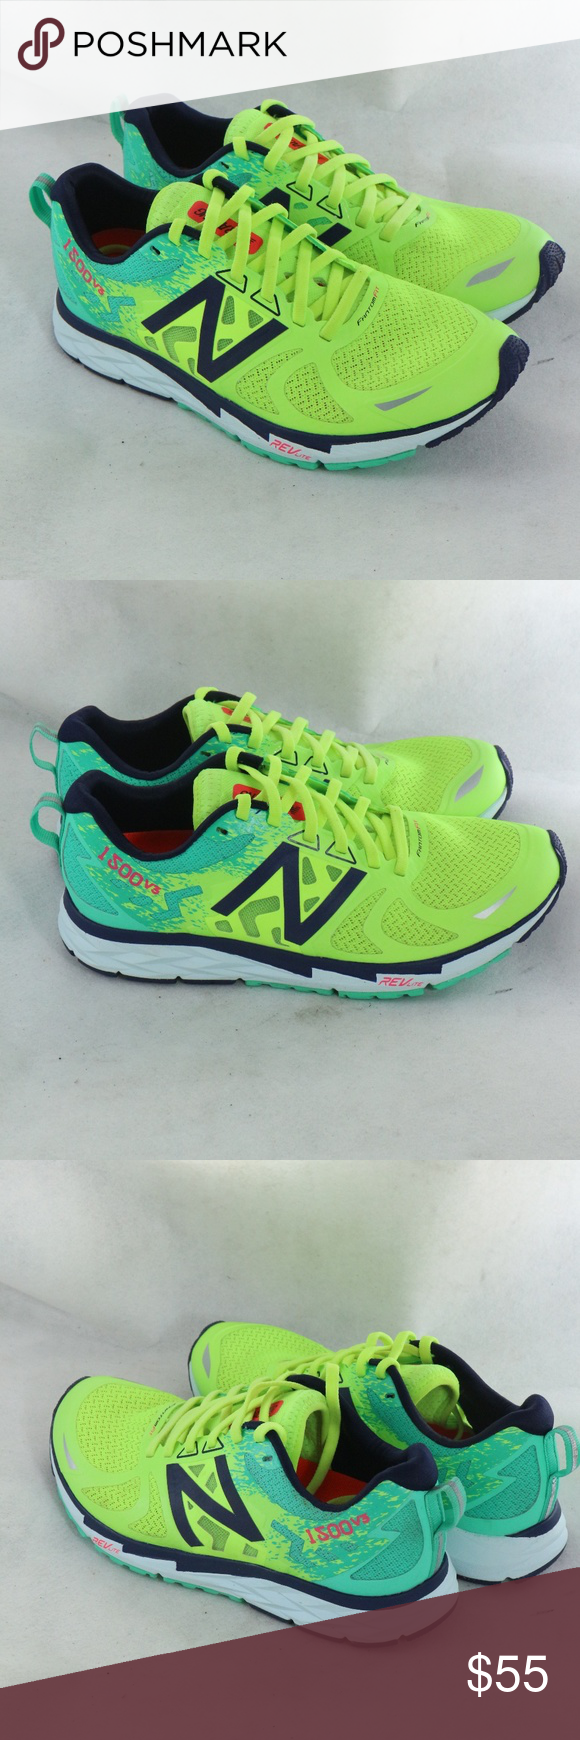 NEW BALANCE W1500V3 Lime Glow/Jade Running Shoes | New balance ...